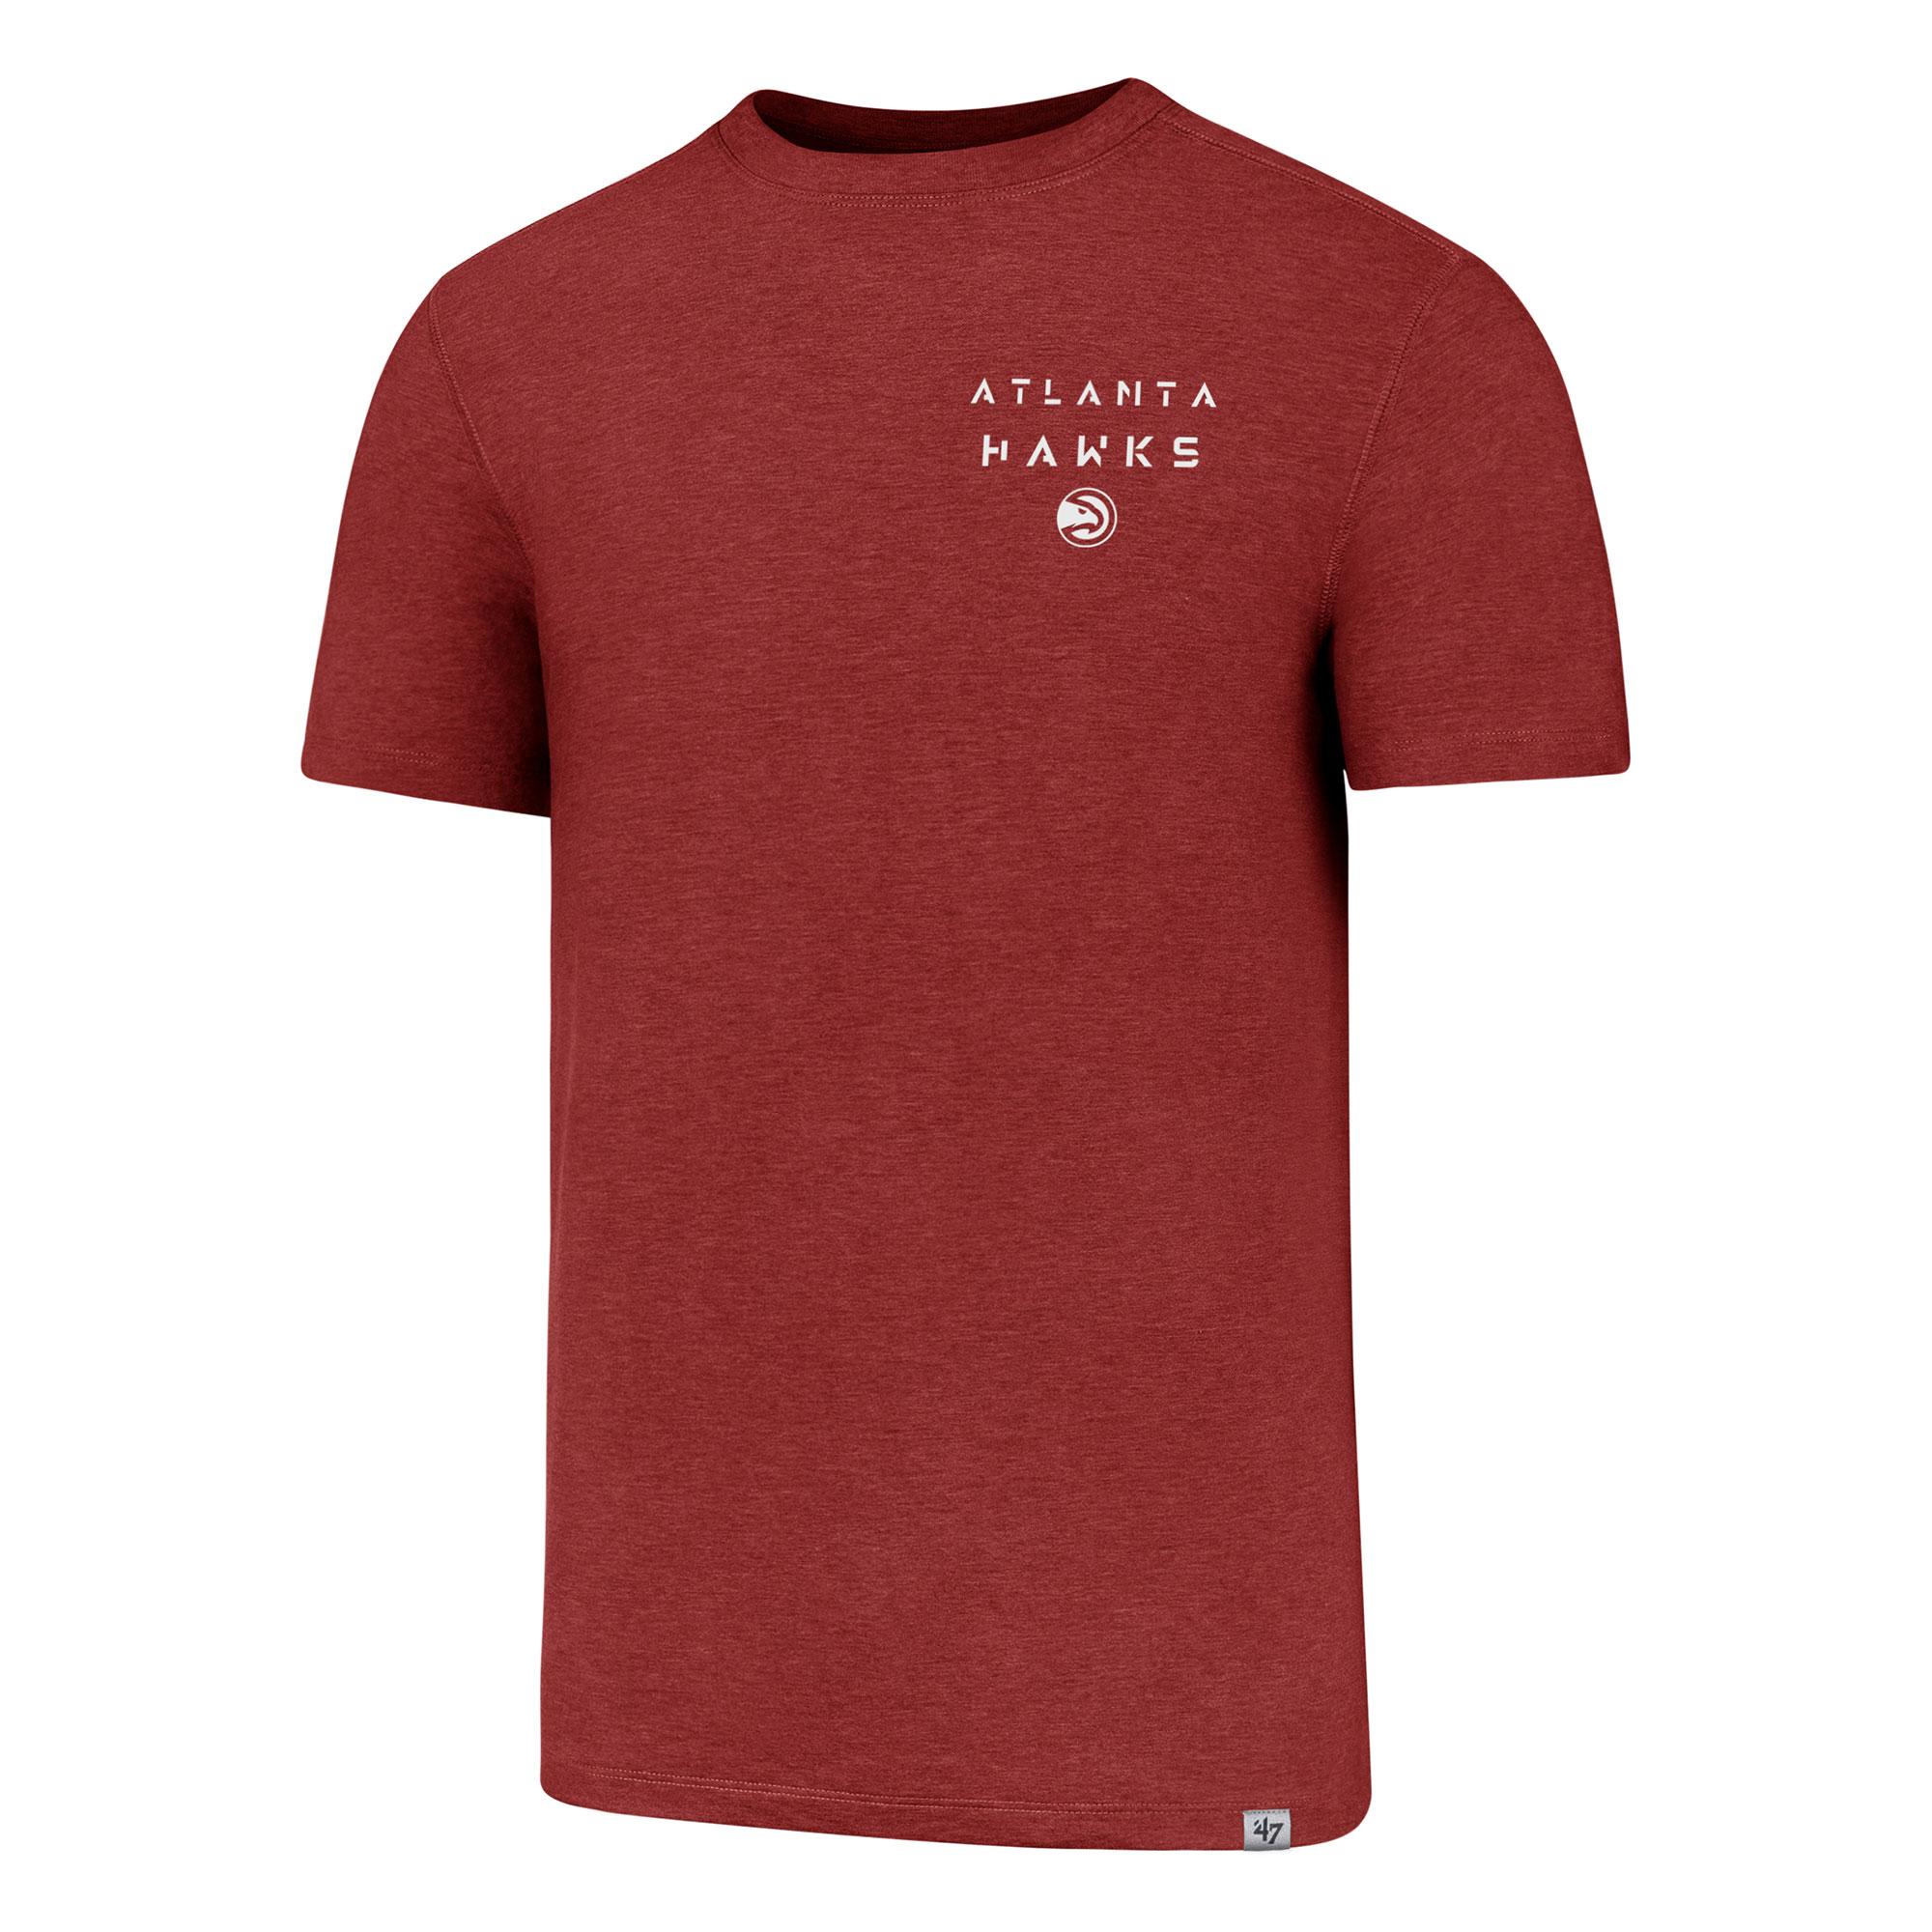 "Image of ""Atlanta Hawks 47 Forward Gravity T-Shirt - Mens"""